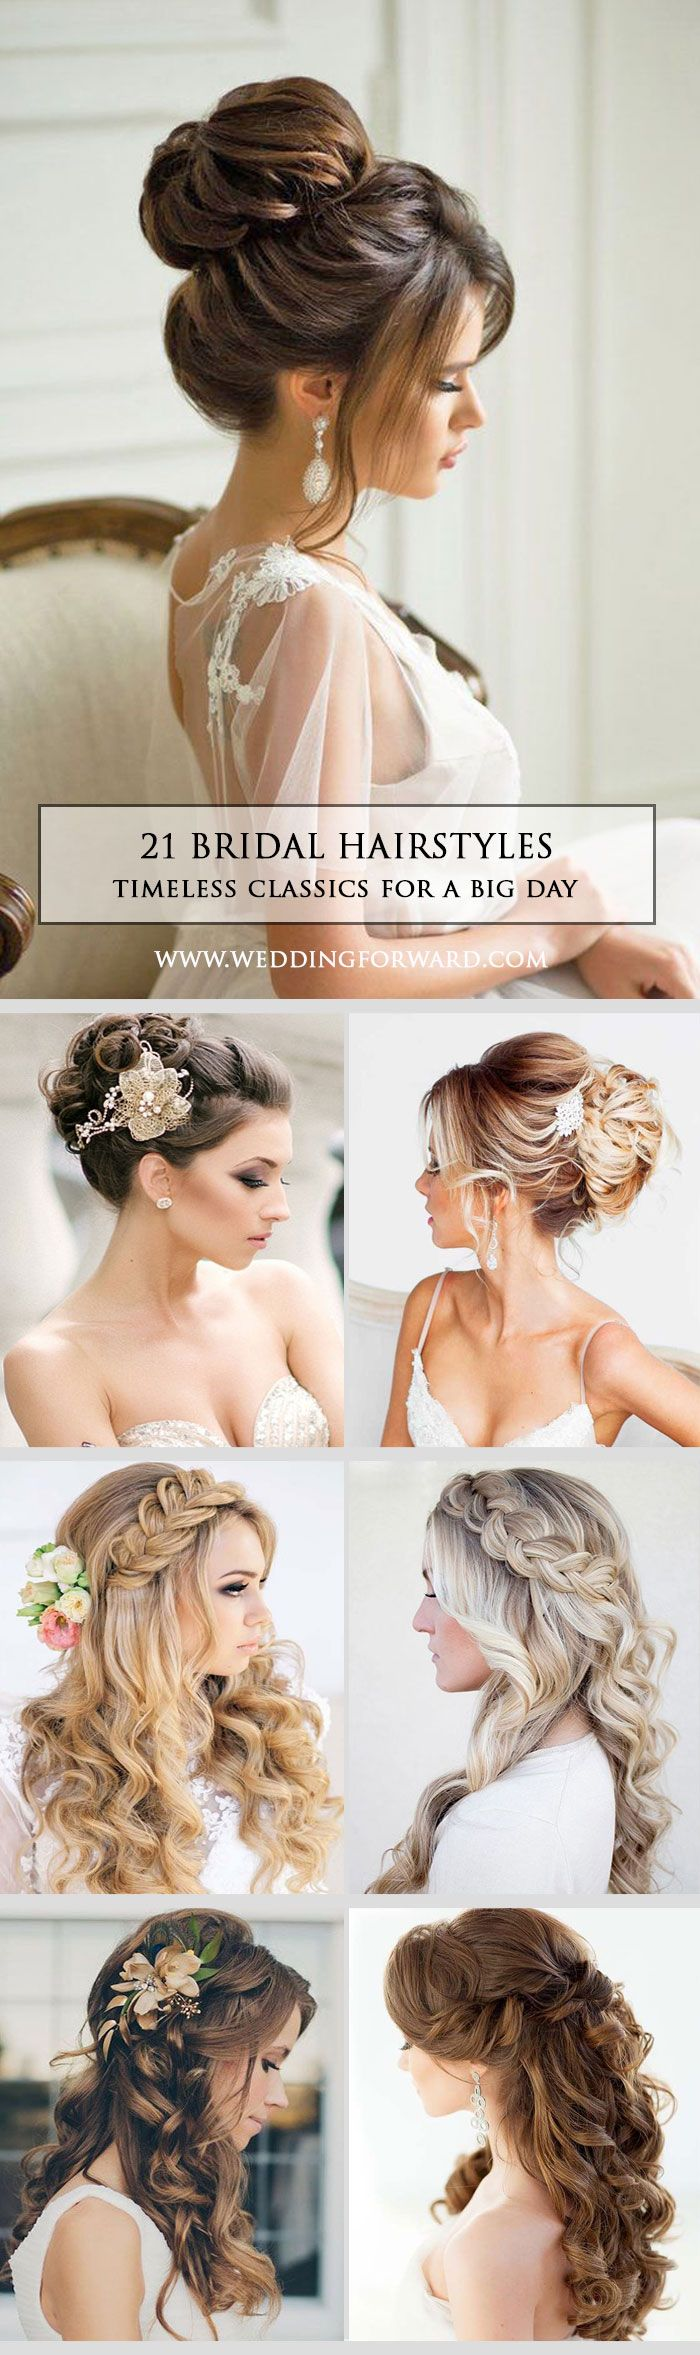 Best 25+ Great hairstyles ideas on Pinterest | Men\u0027s hairstyles ...